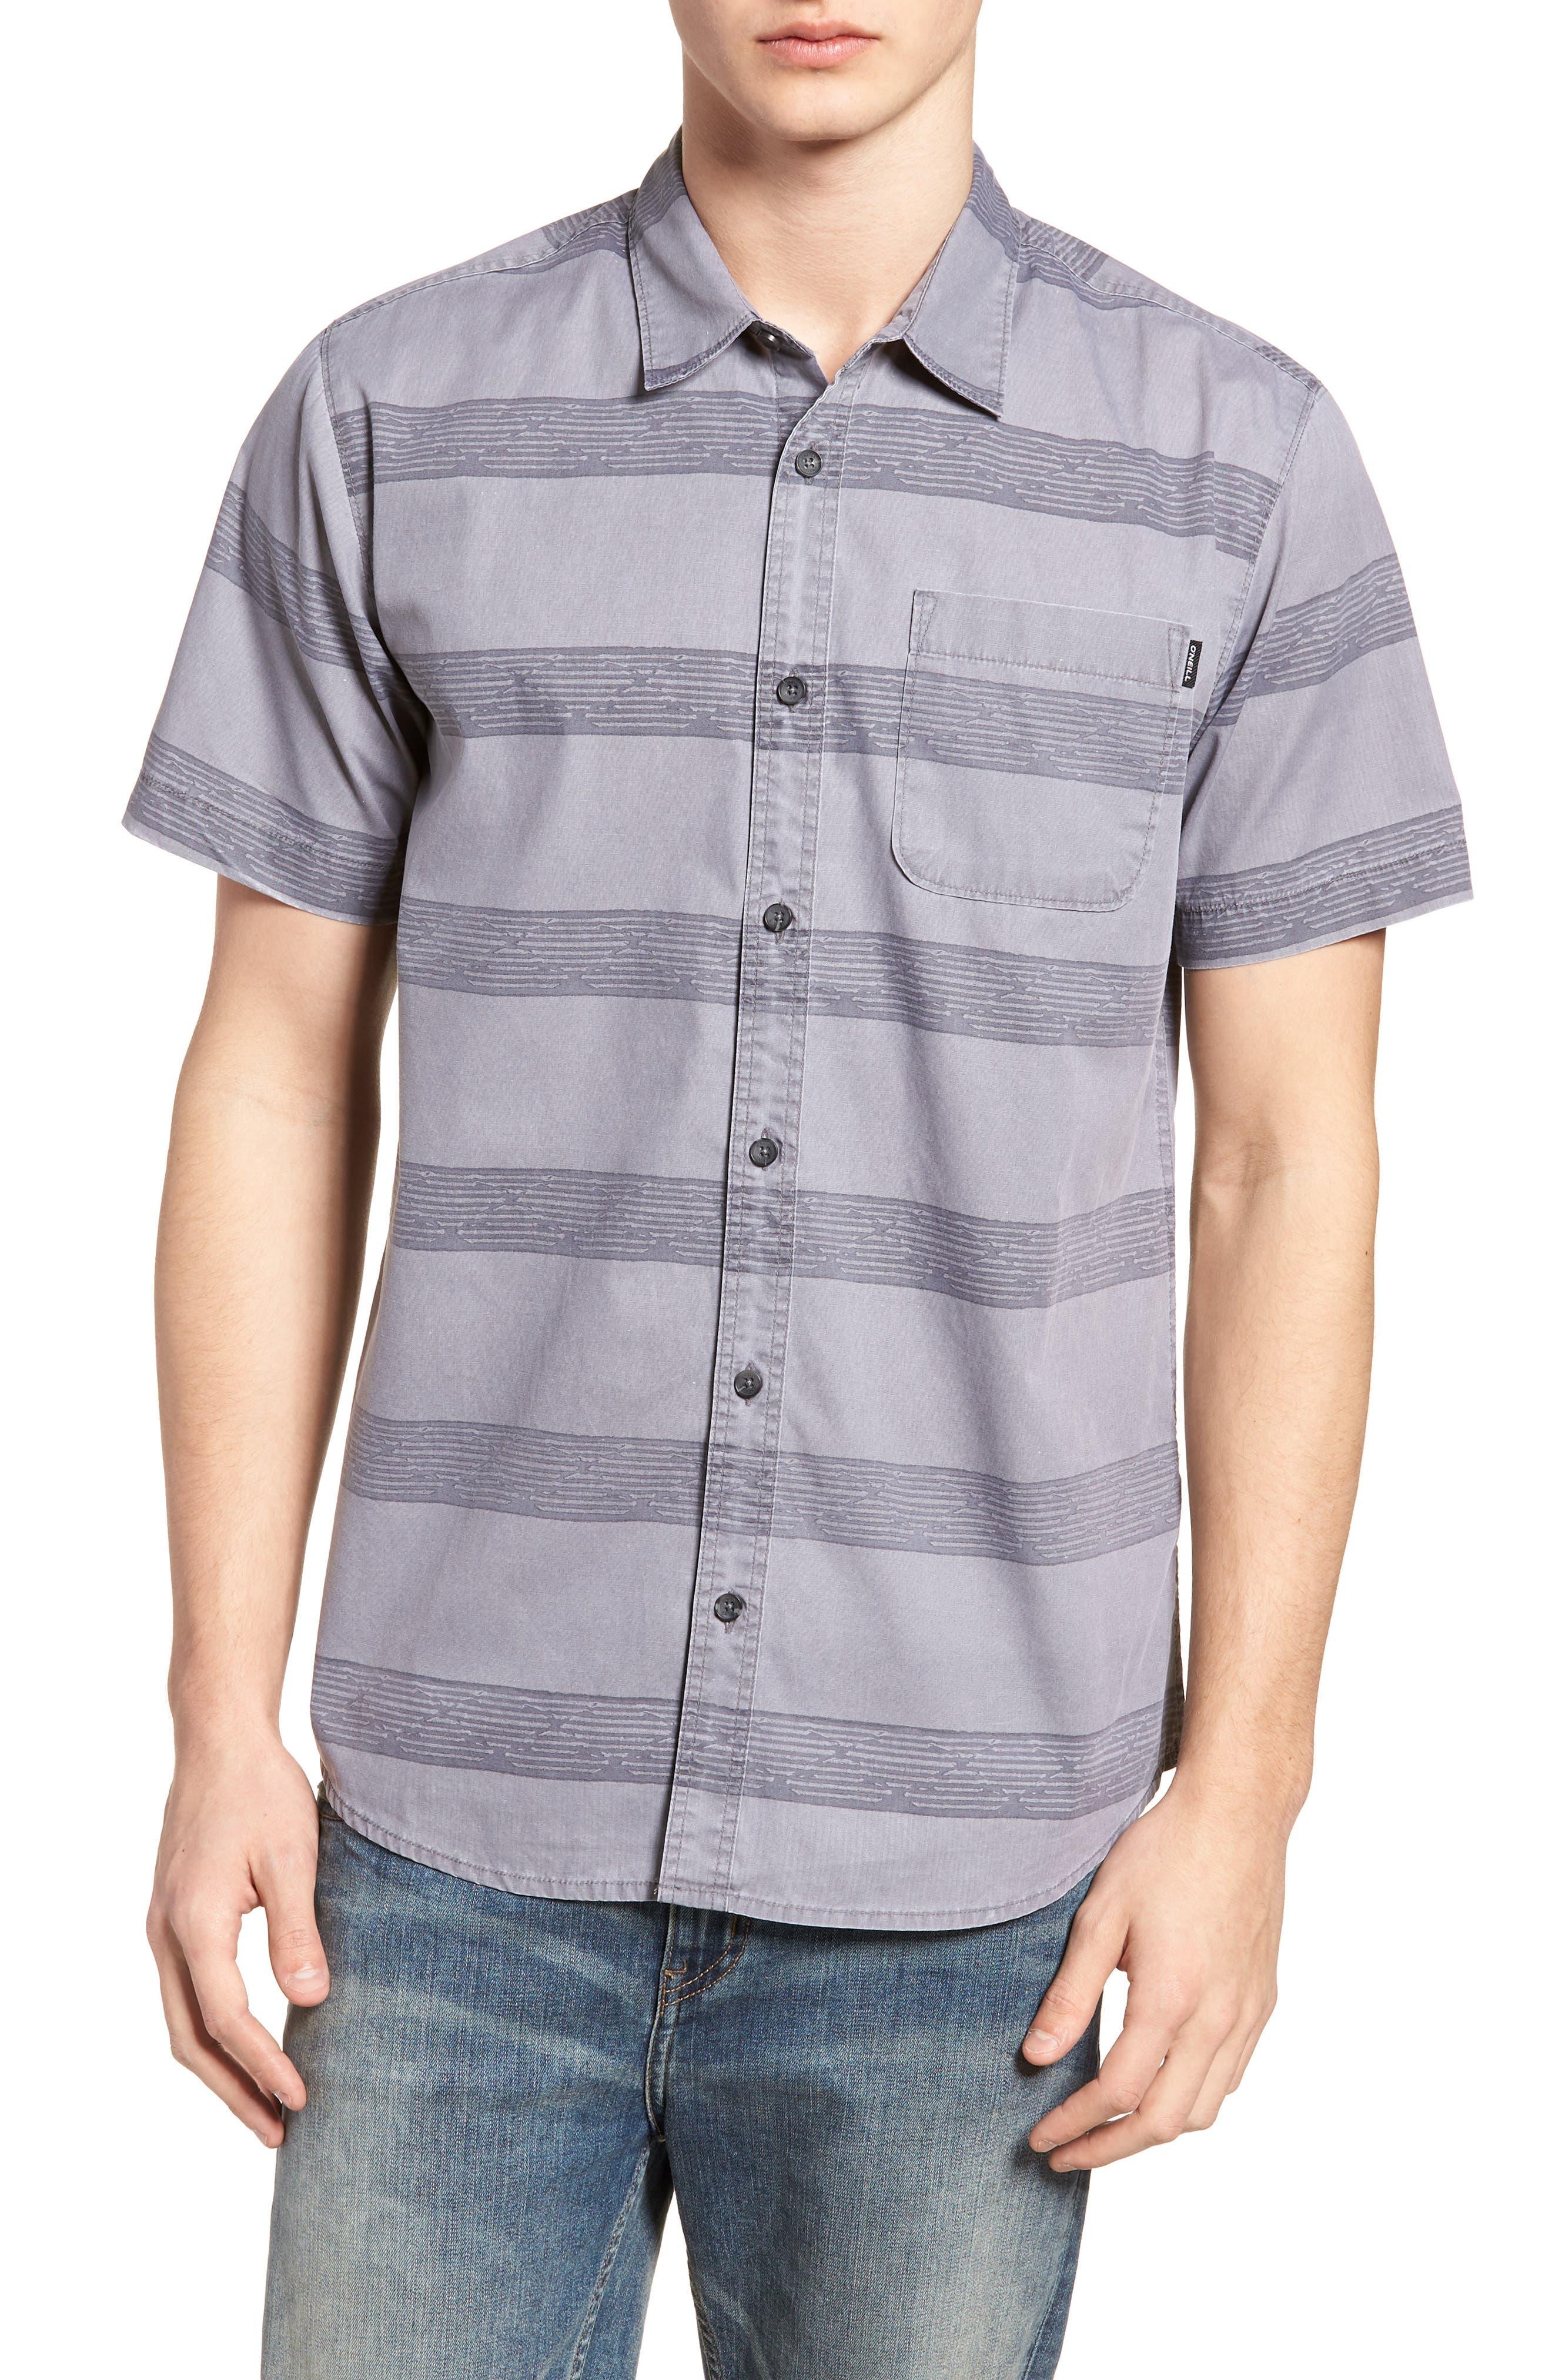 O'NEILL Wagner Woven Shirt, Main, color, 036